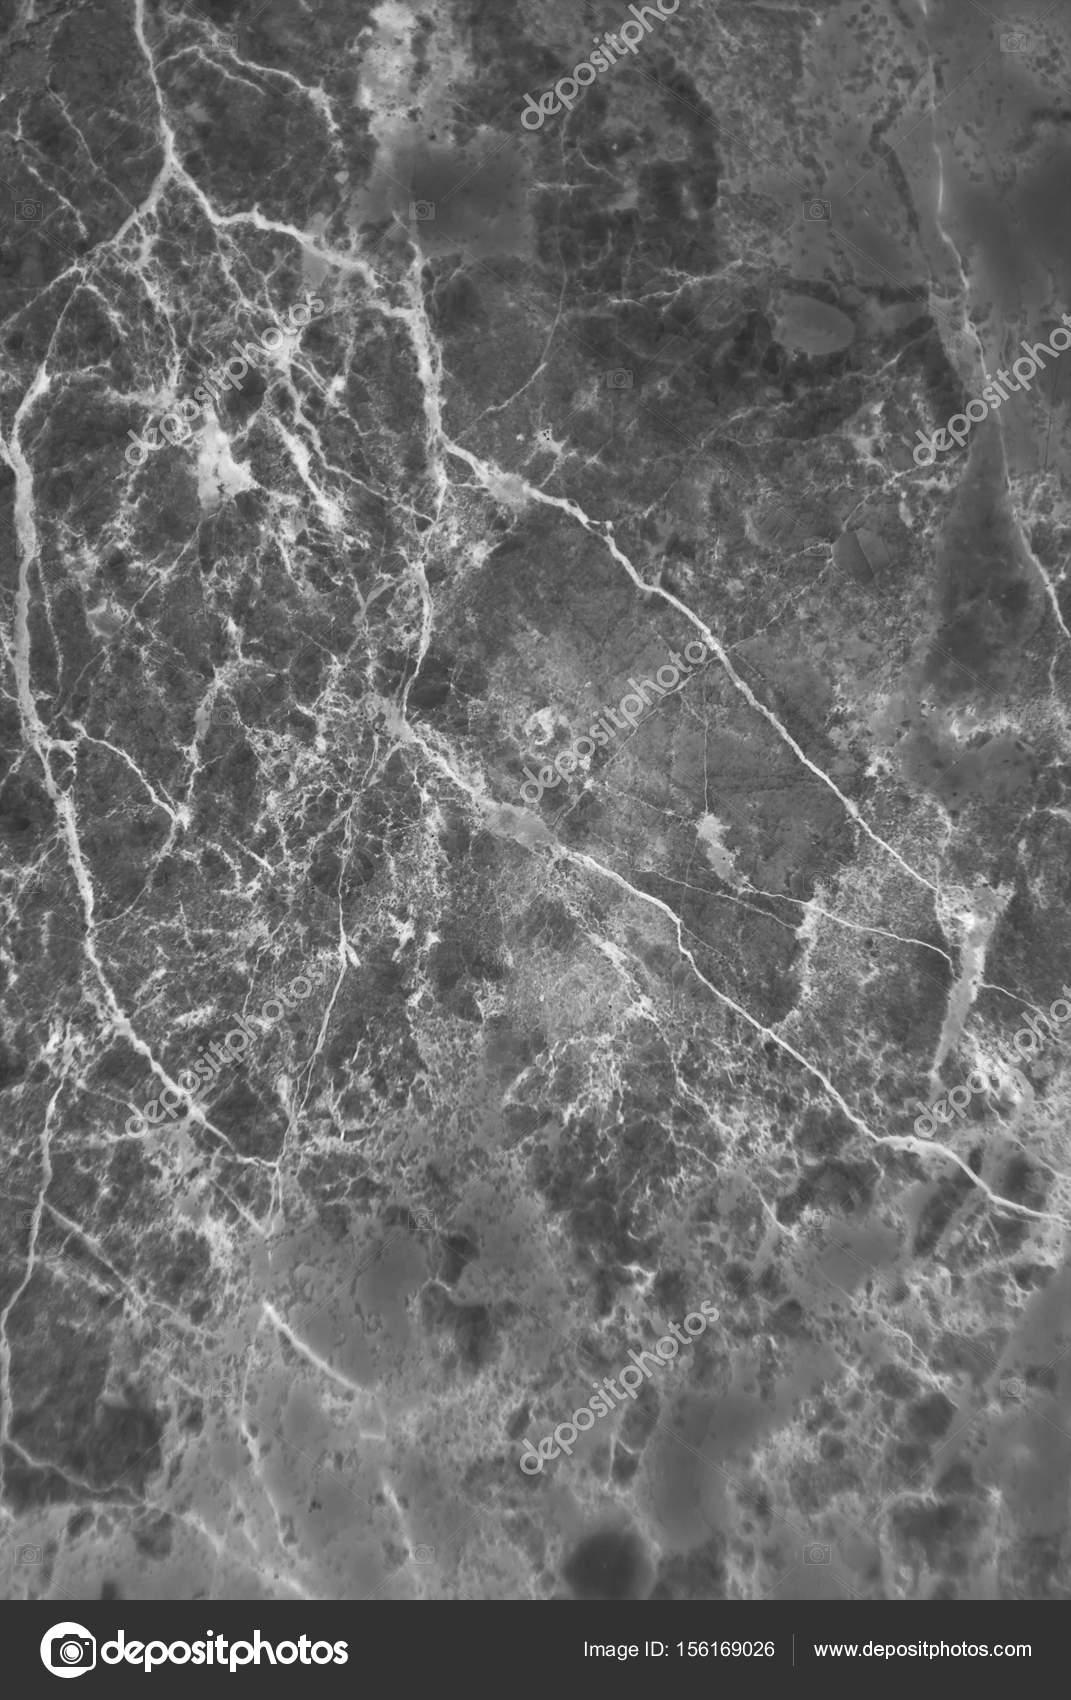 Dark Grey Marble Texture Shot Subtle White Veining Stock Photo C Aioonrak Gmail Com 156169026